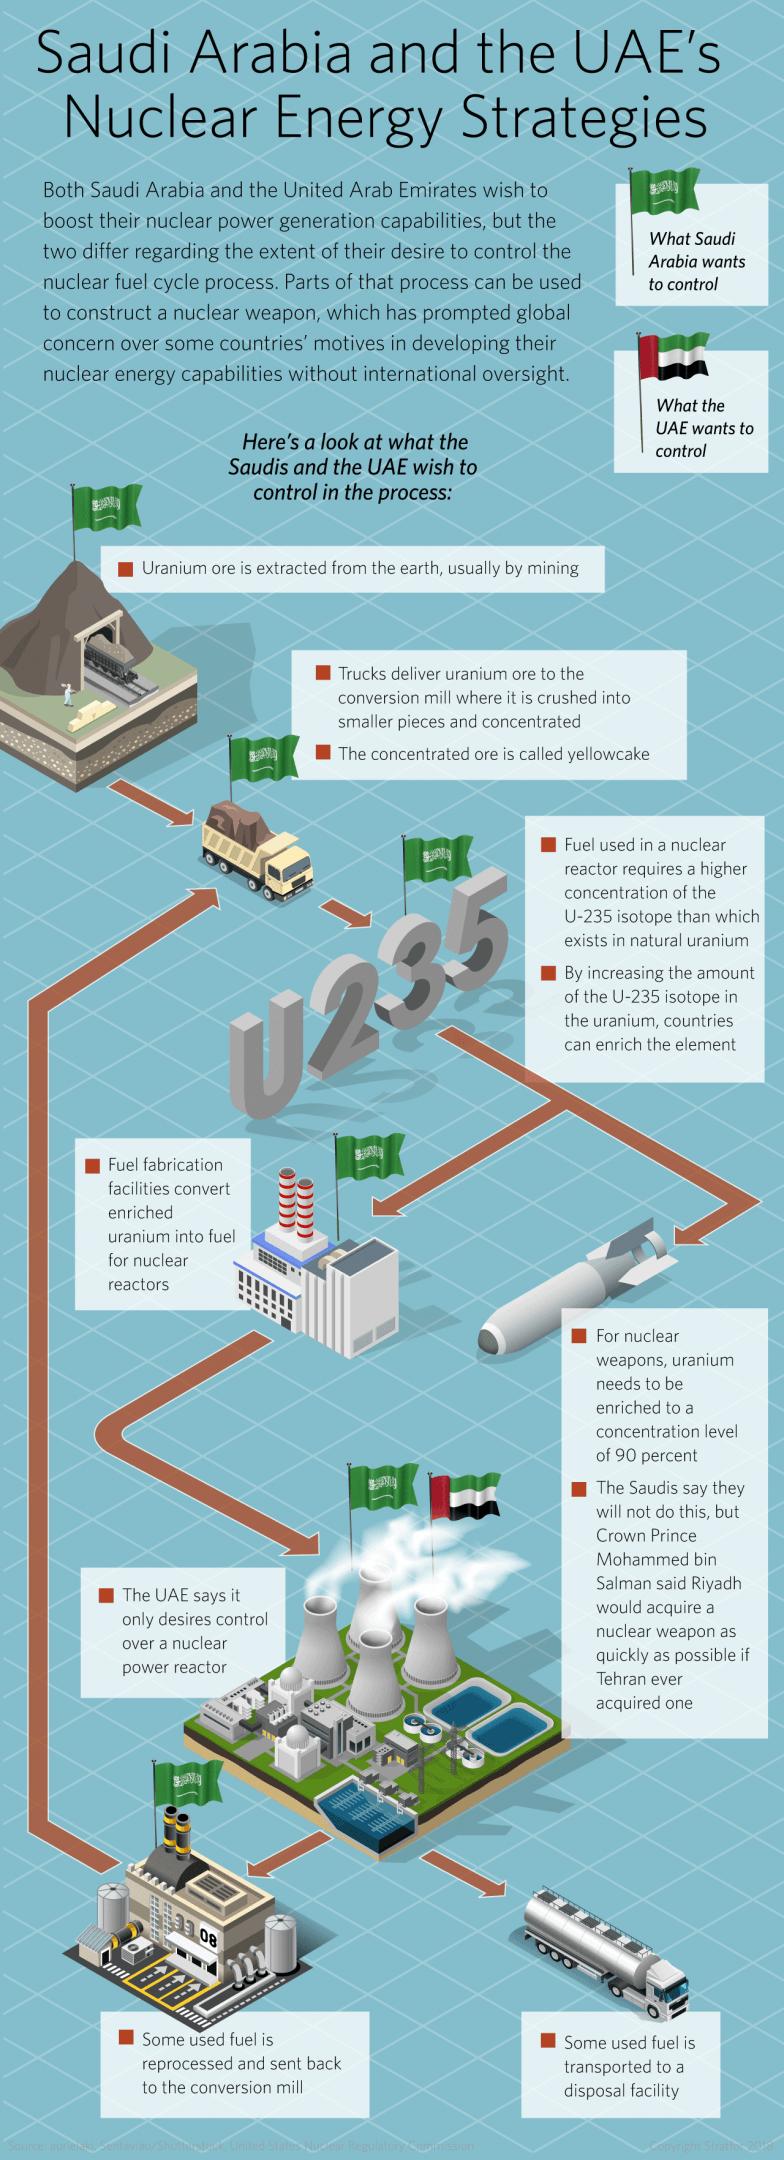 Saudi Arabia Goes Shopping for a Nuclear Deal